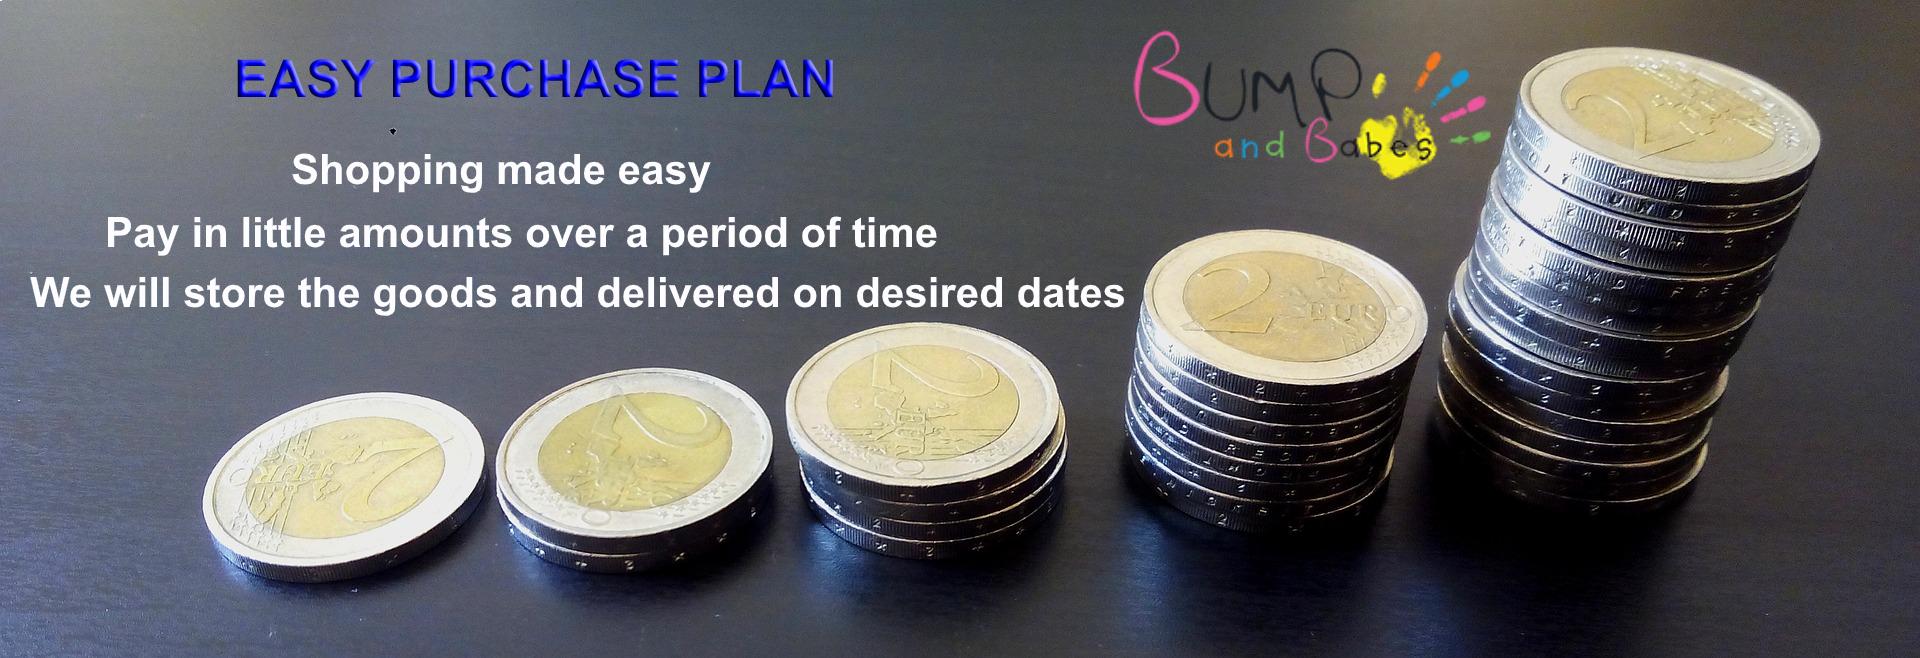 easy-purchase-plan.jpg